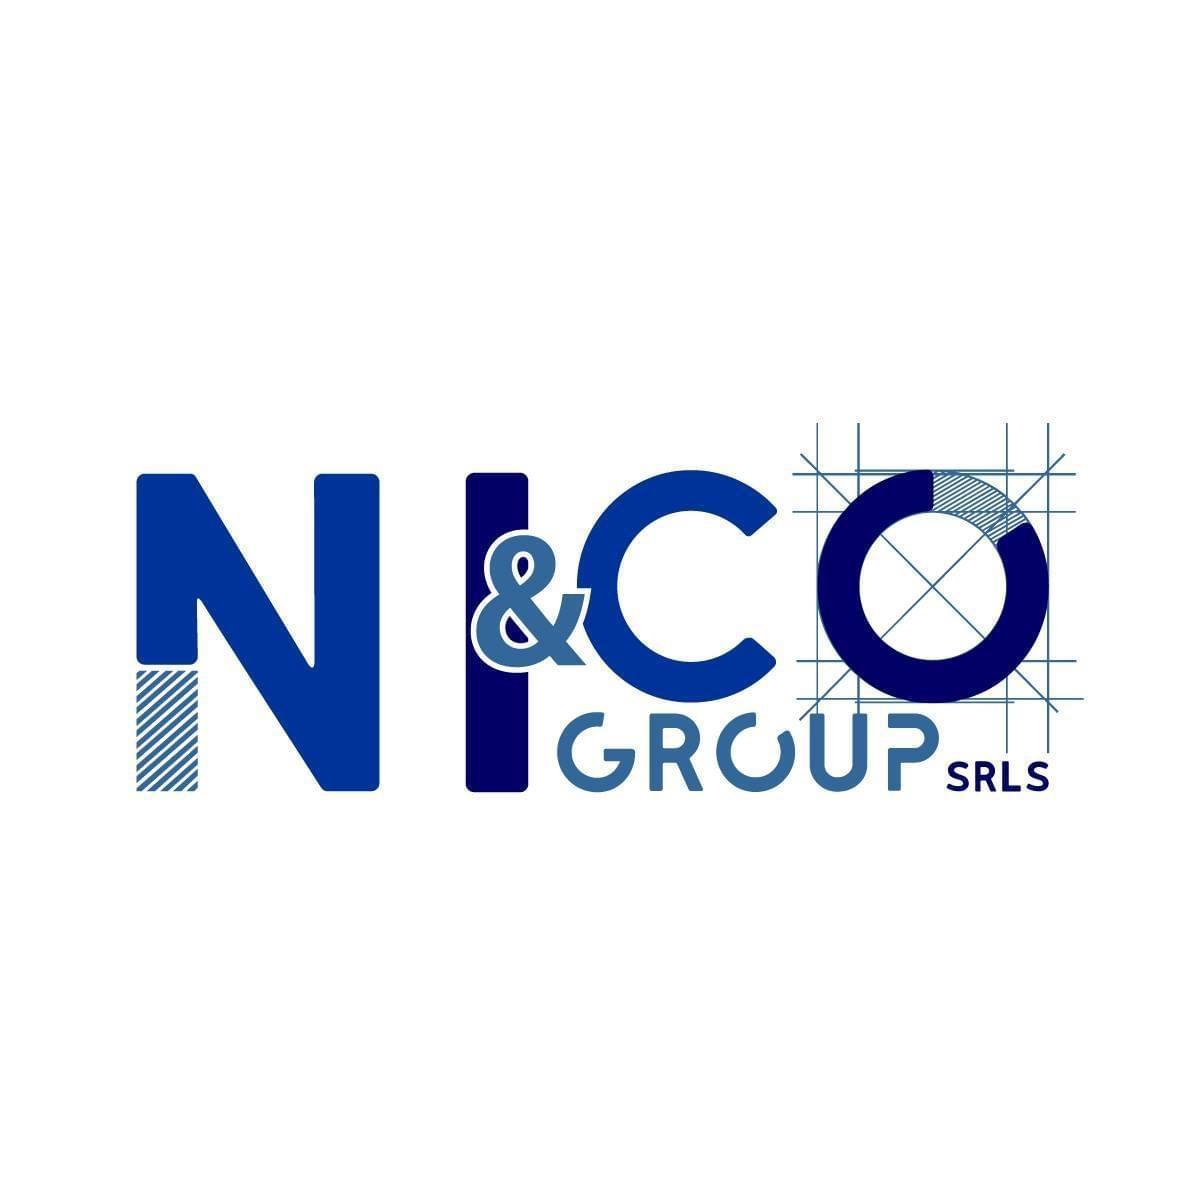 NI&CO Group Srls